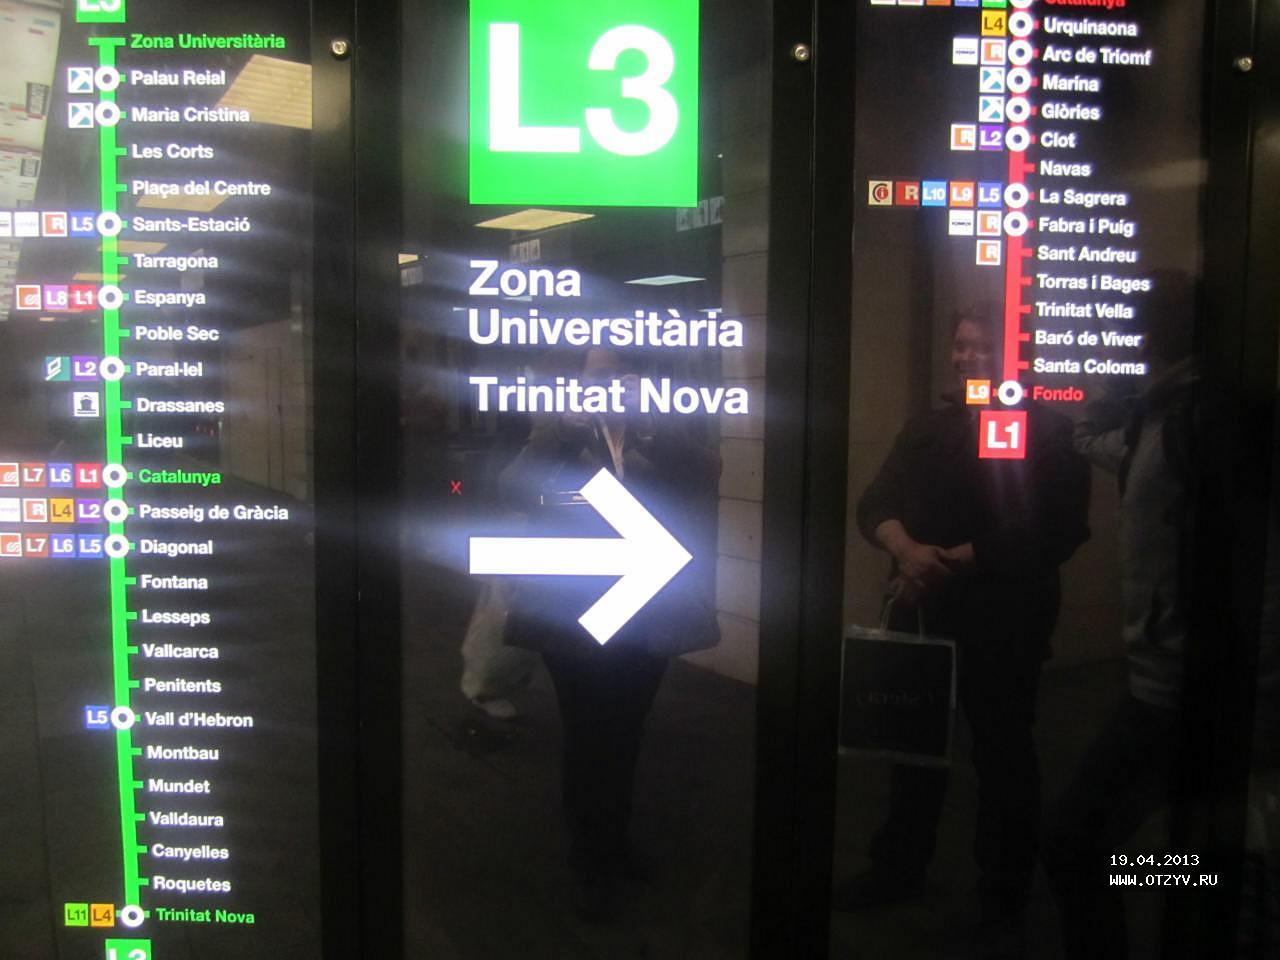 схема движения маршрута l2 ллорет де мар